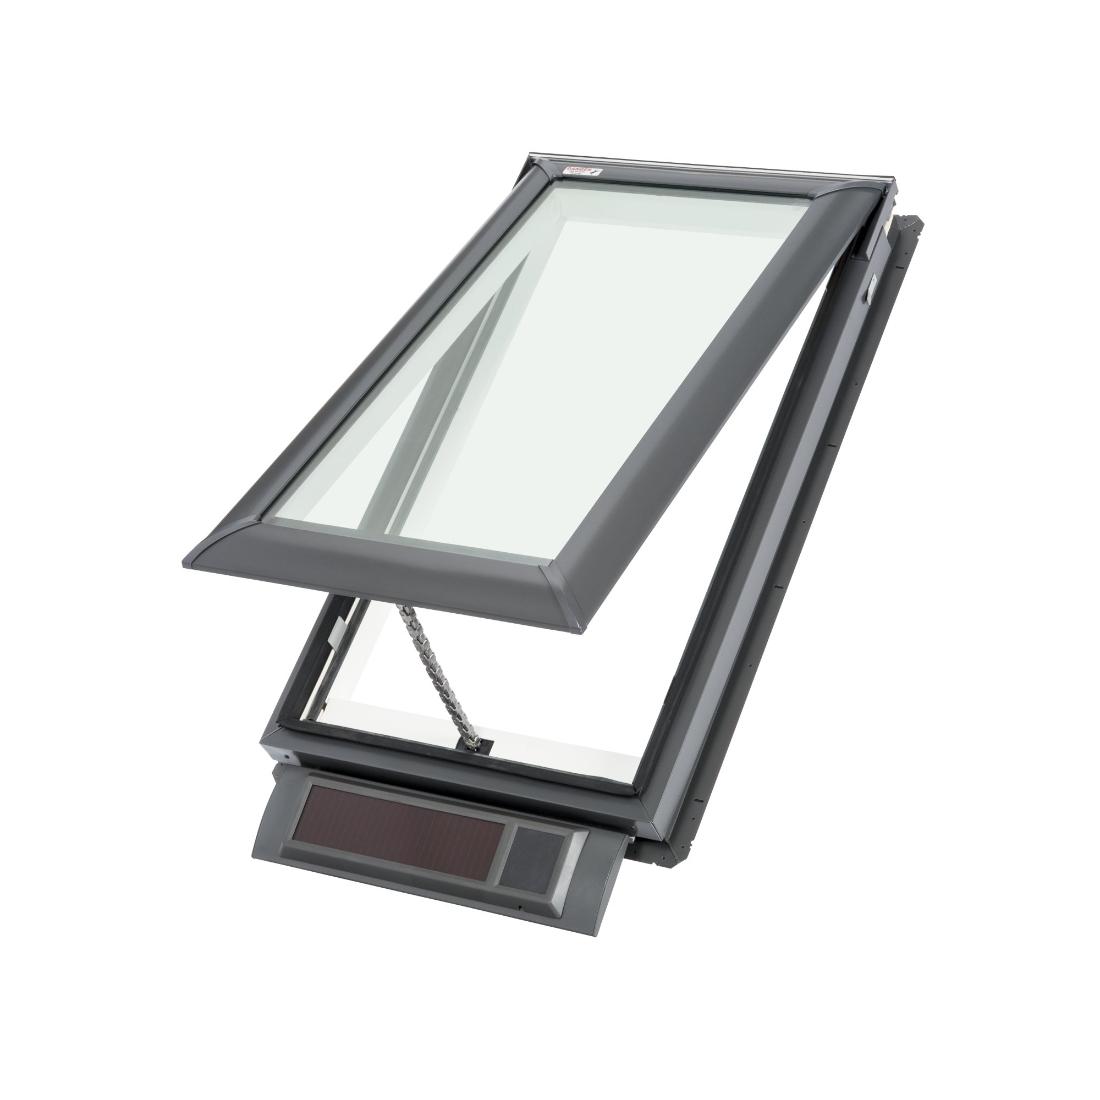 Solar Powered Skylight 780 x 1180mm